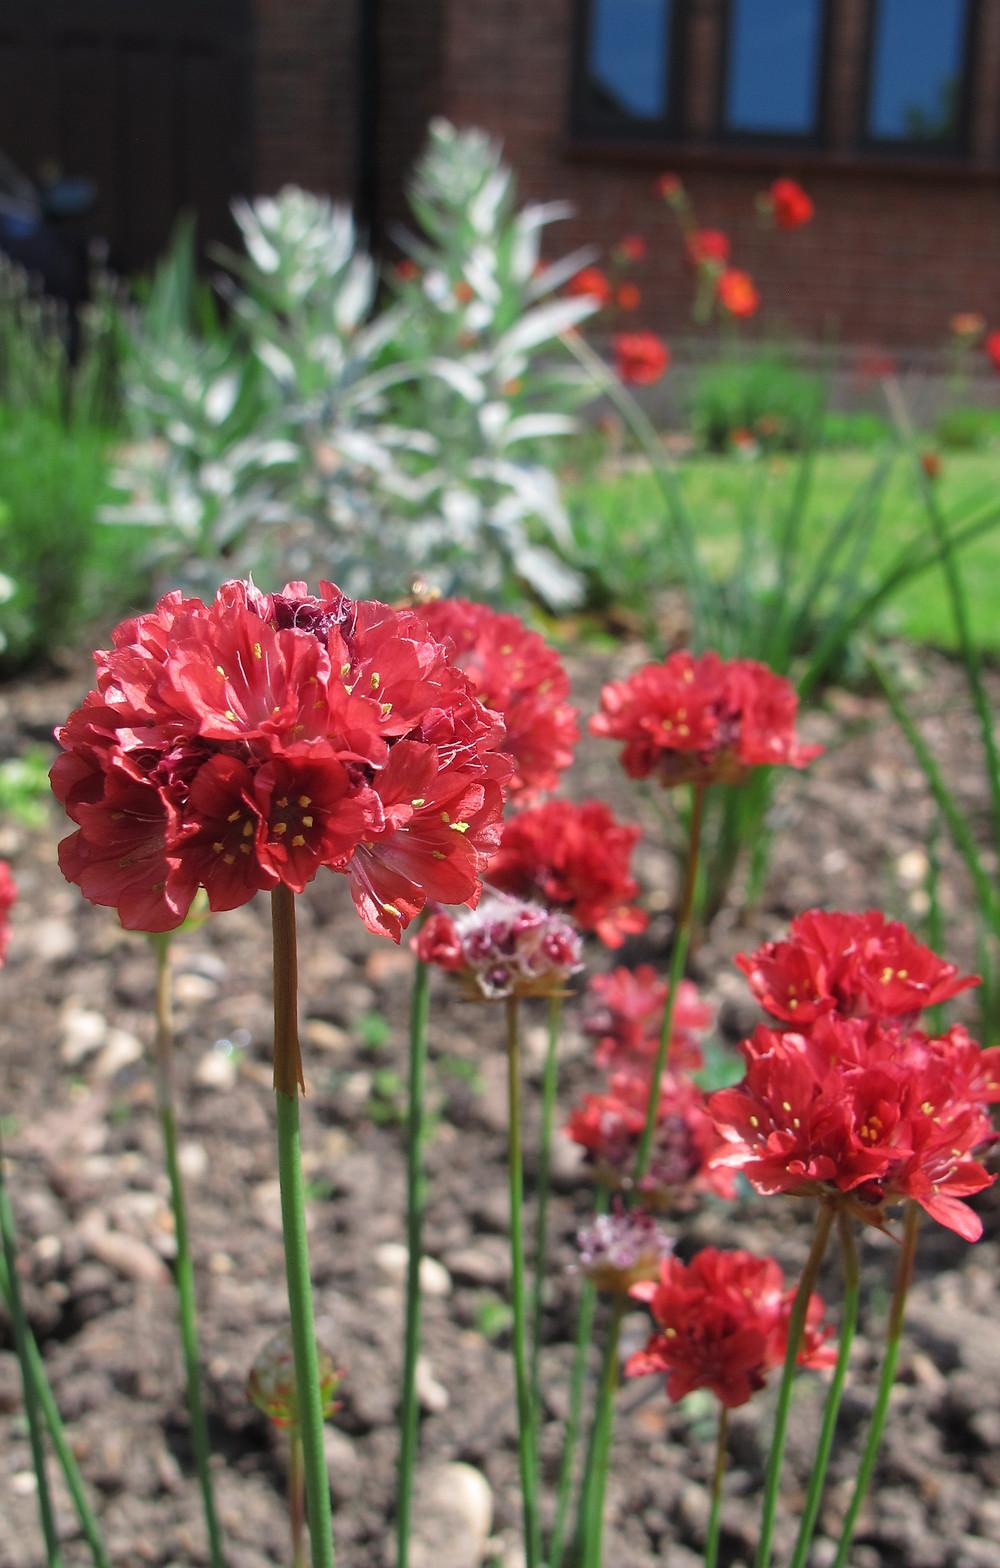 Armeria 'Ballerina Red' flowering in May